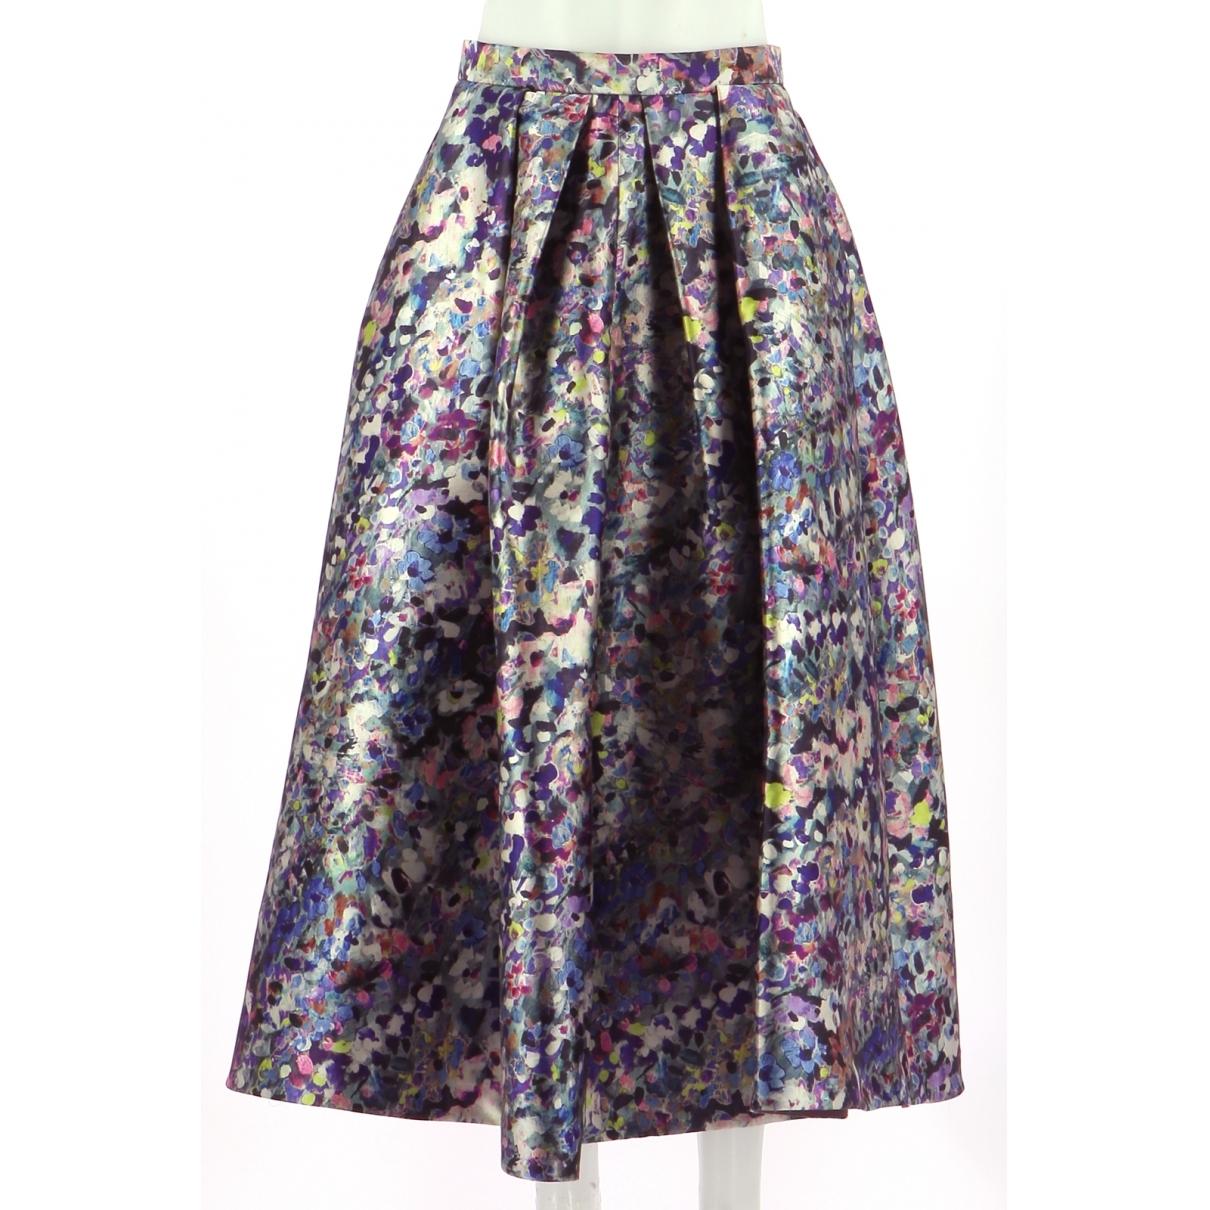 Lk Bennett - Jupe   pour femme - multicolore